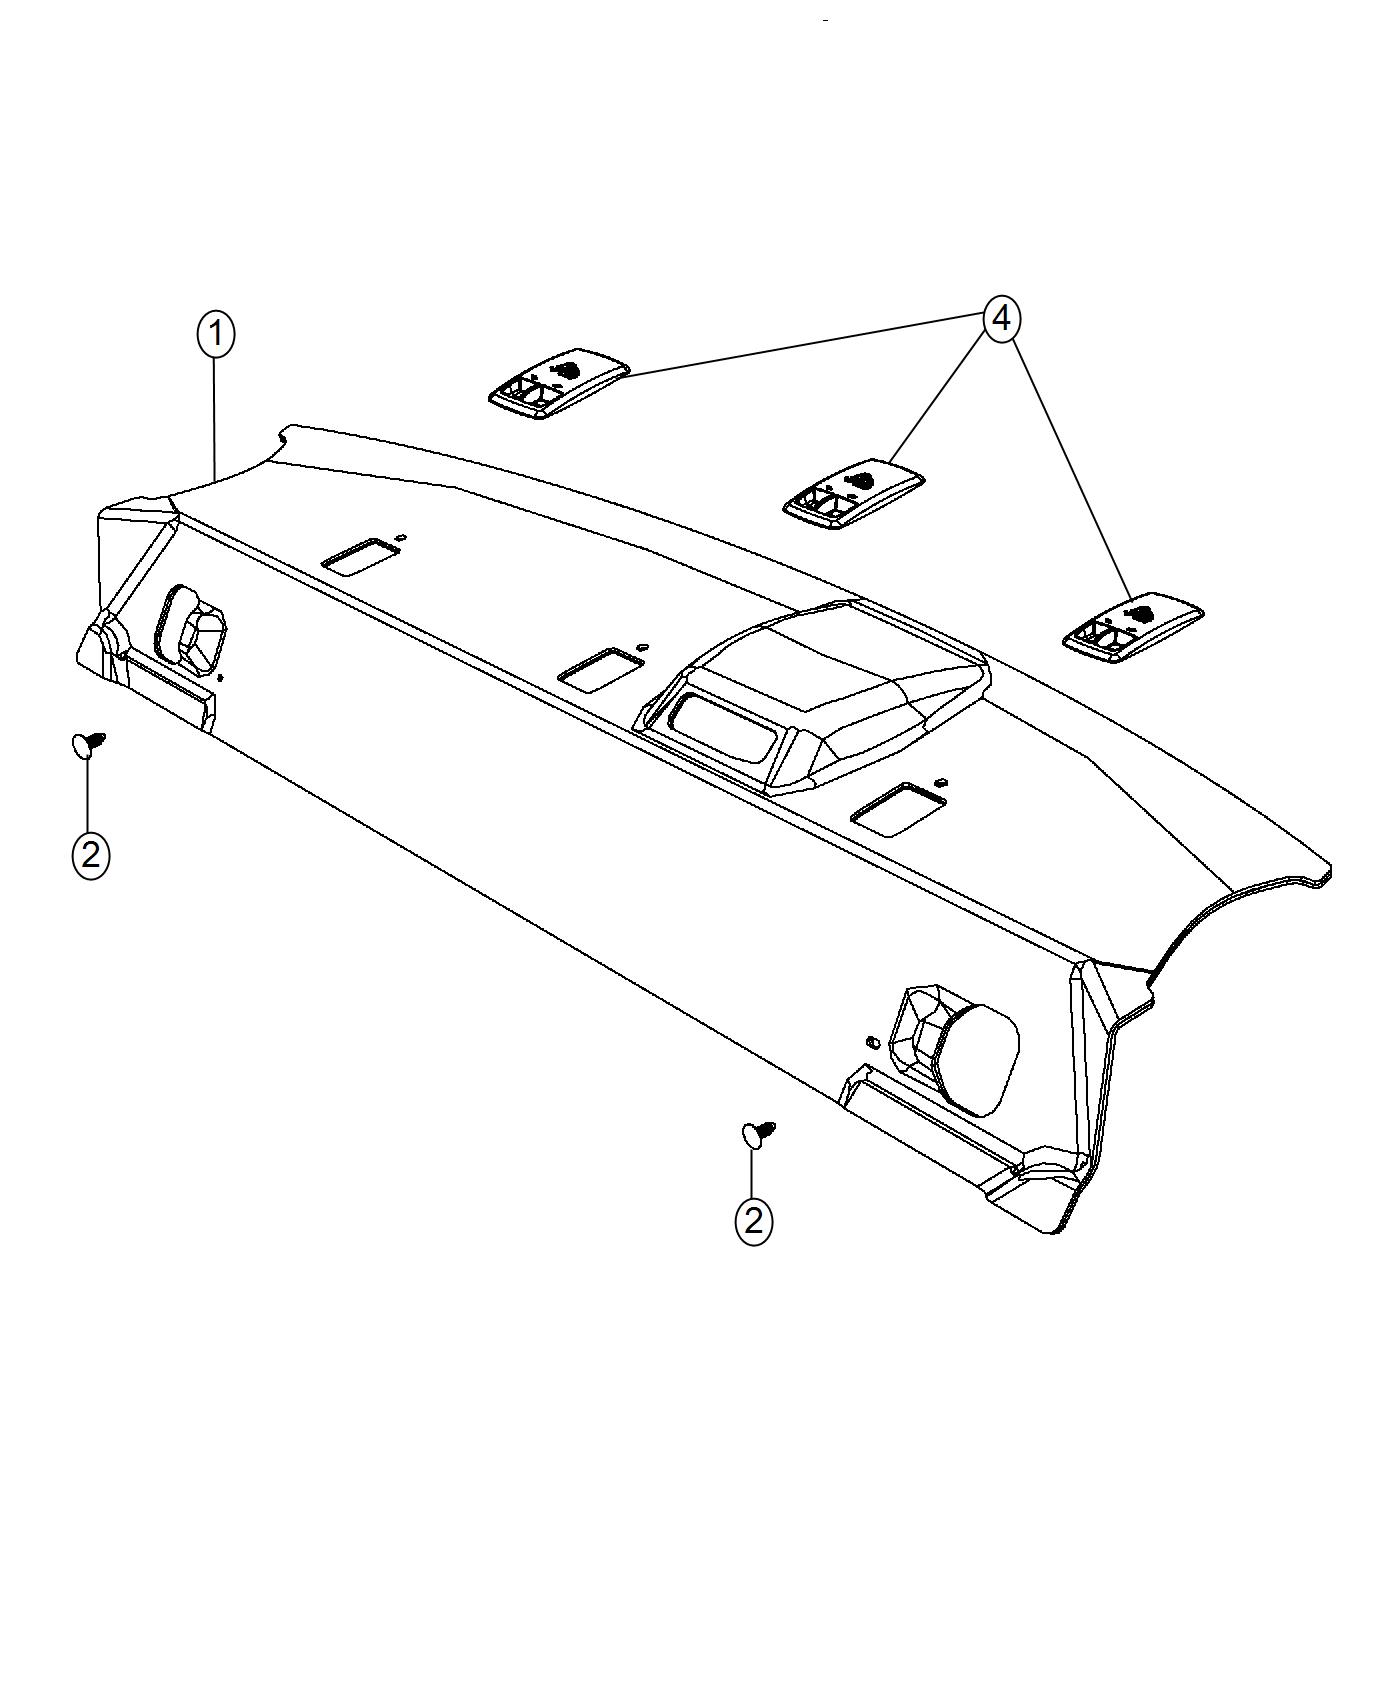 Dodge Cover Anchor Export Trim No Description